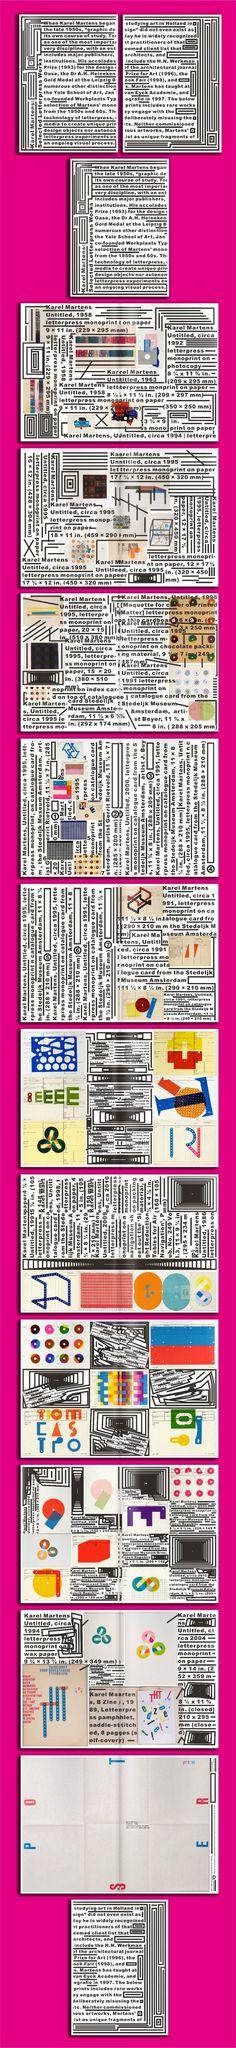 Karel Martens: Selected Letterpress Works - Jiyun Lou | Everything NewDesign